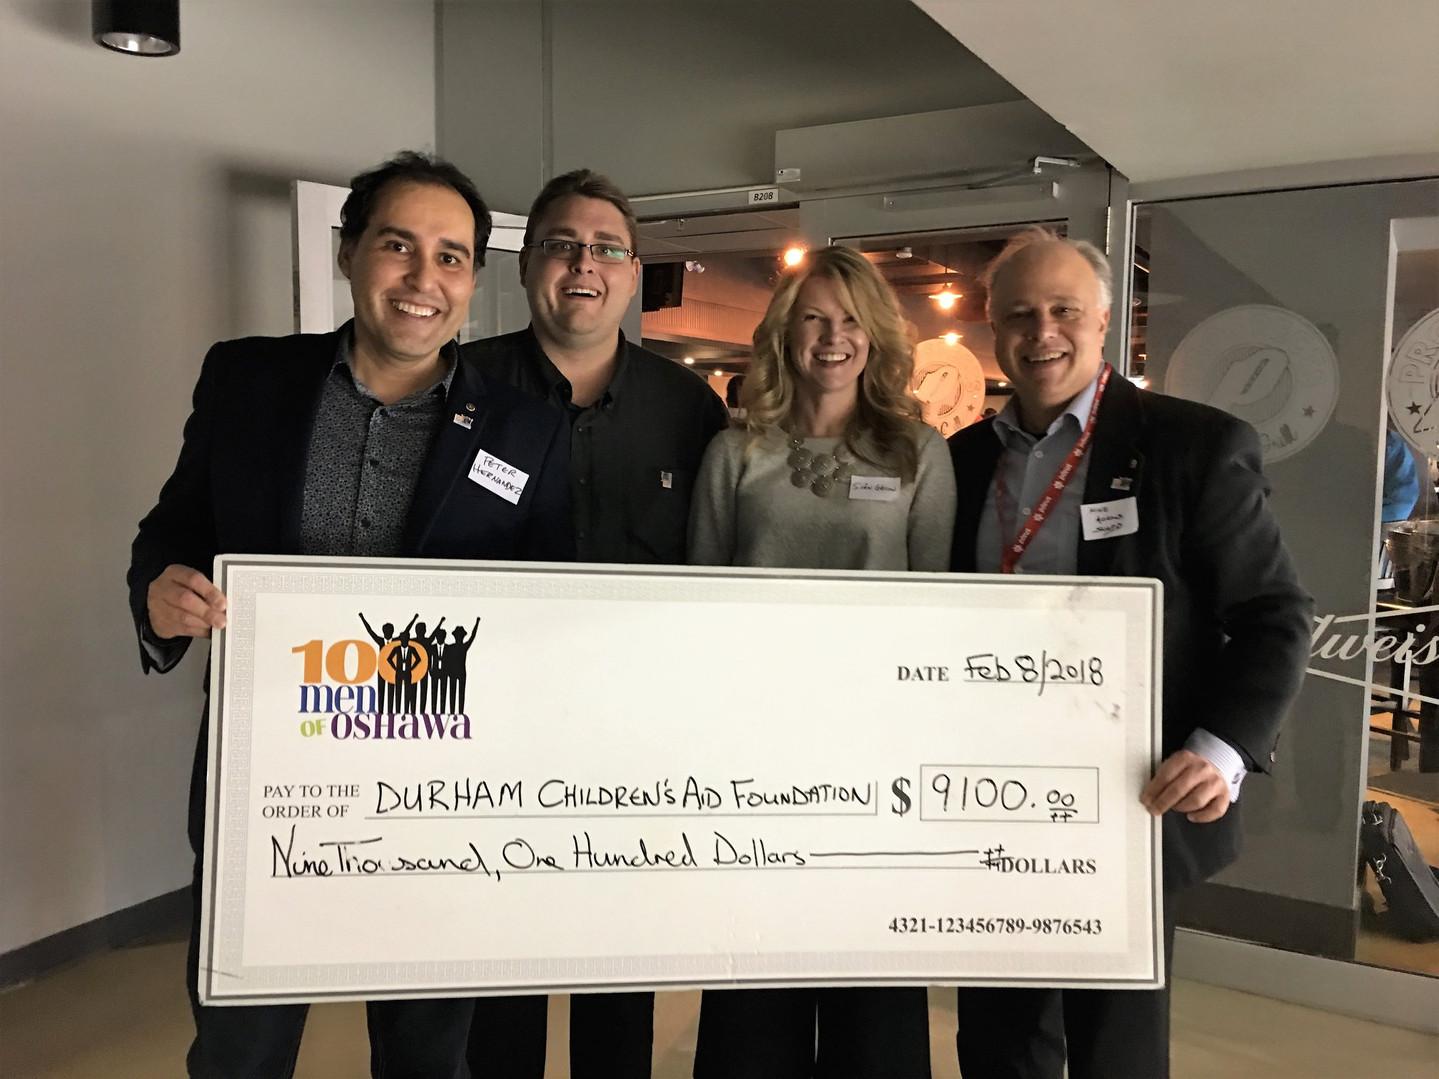 Presenting 100 Men of Oshawa Donation to Durham Children's Aid Foundation